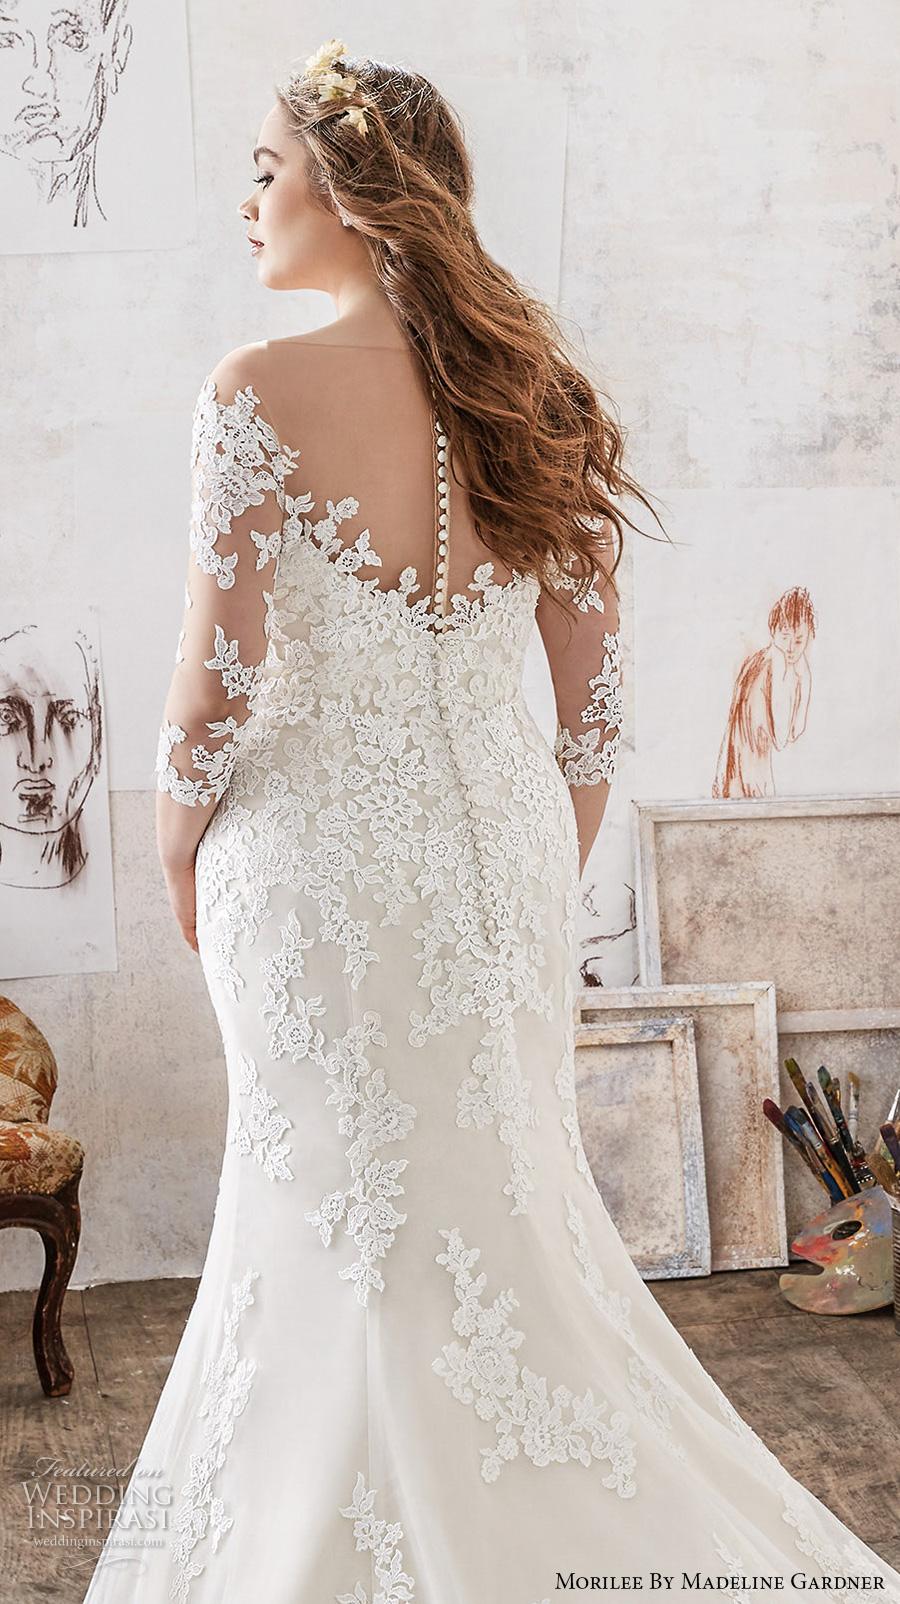 Plus Size Mermaid Wedding Gowns 14 Lovely morilee julietta spring bridal